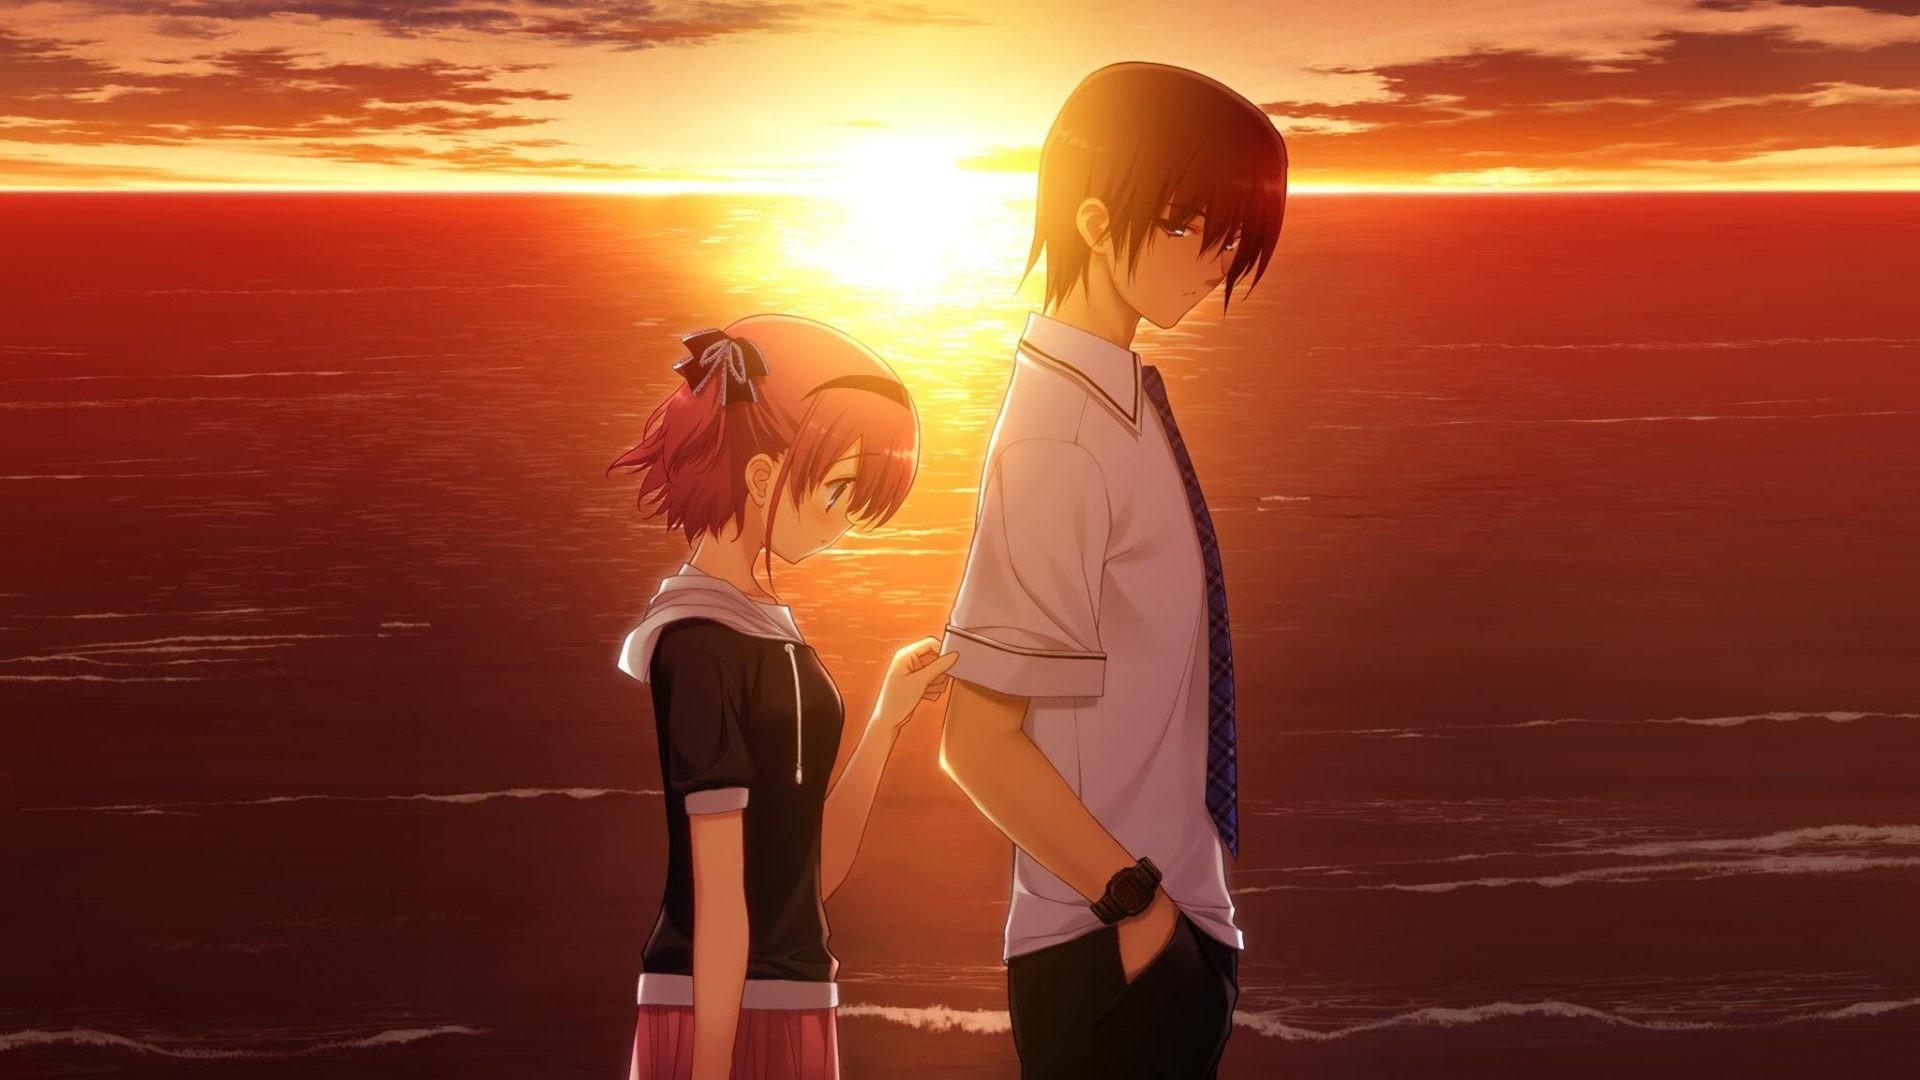 Res: 1920x1080, Sad Anime Couple